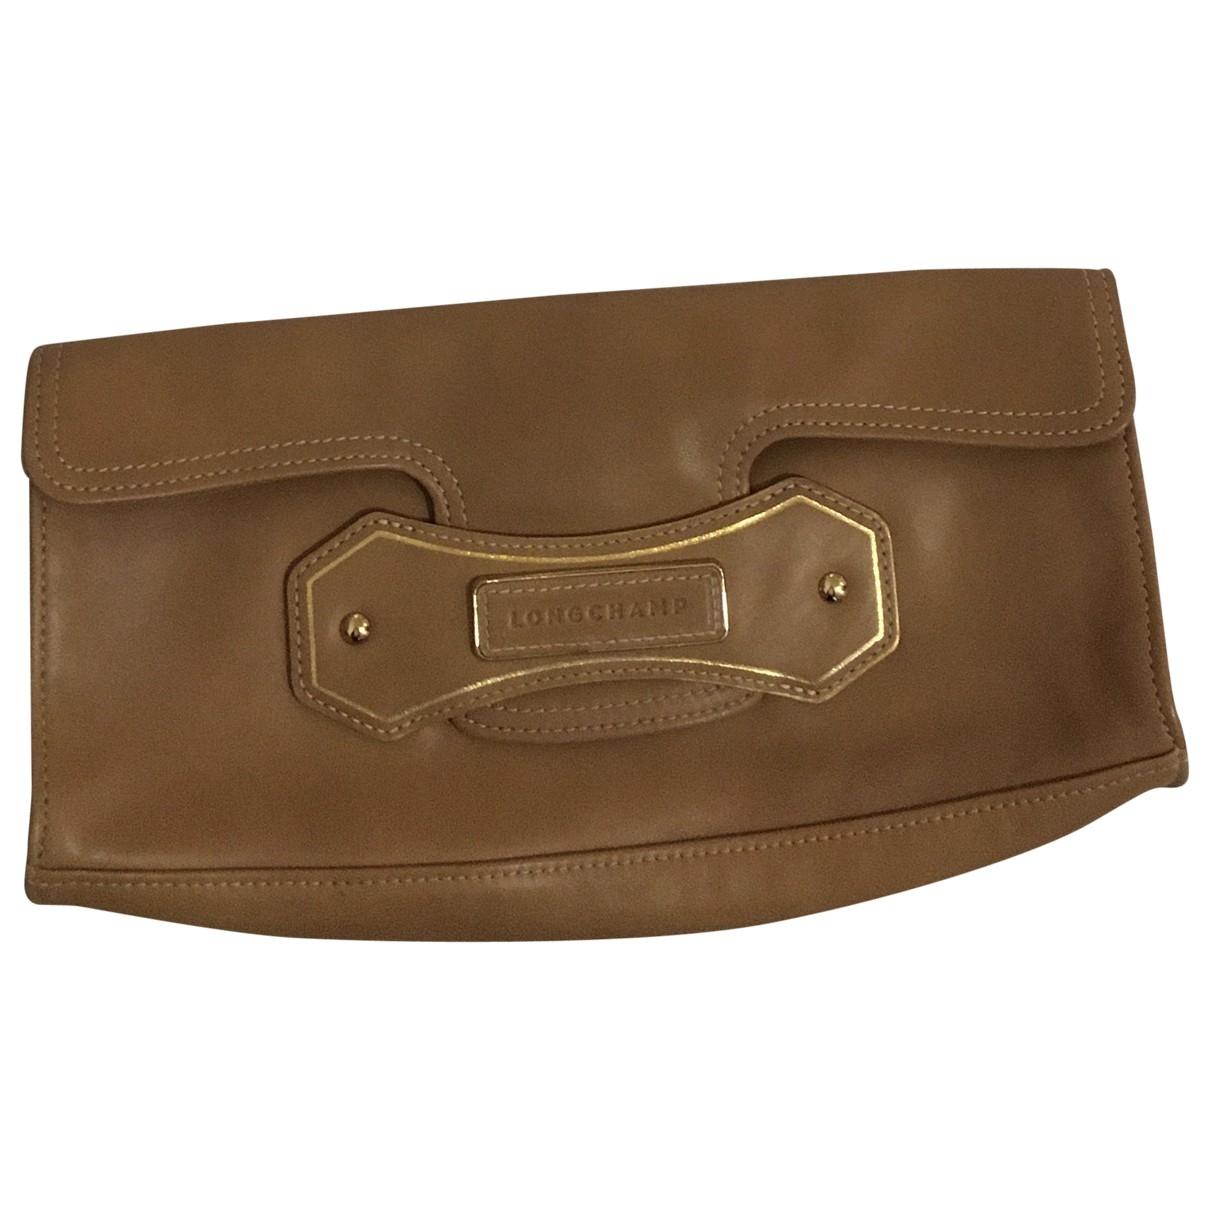 Longchamp \N Brown Leather Clutch bag for Women \N